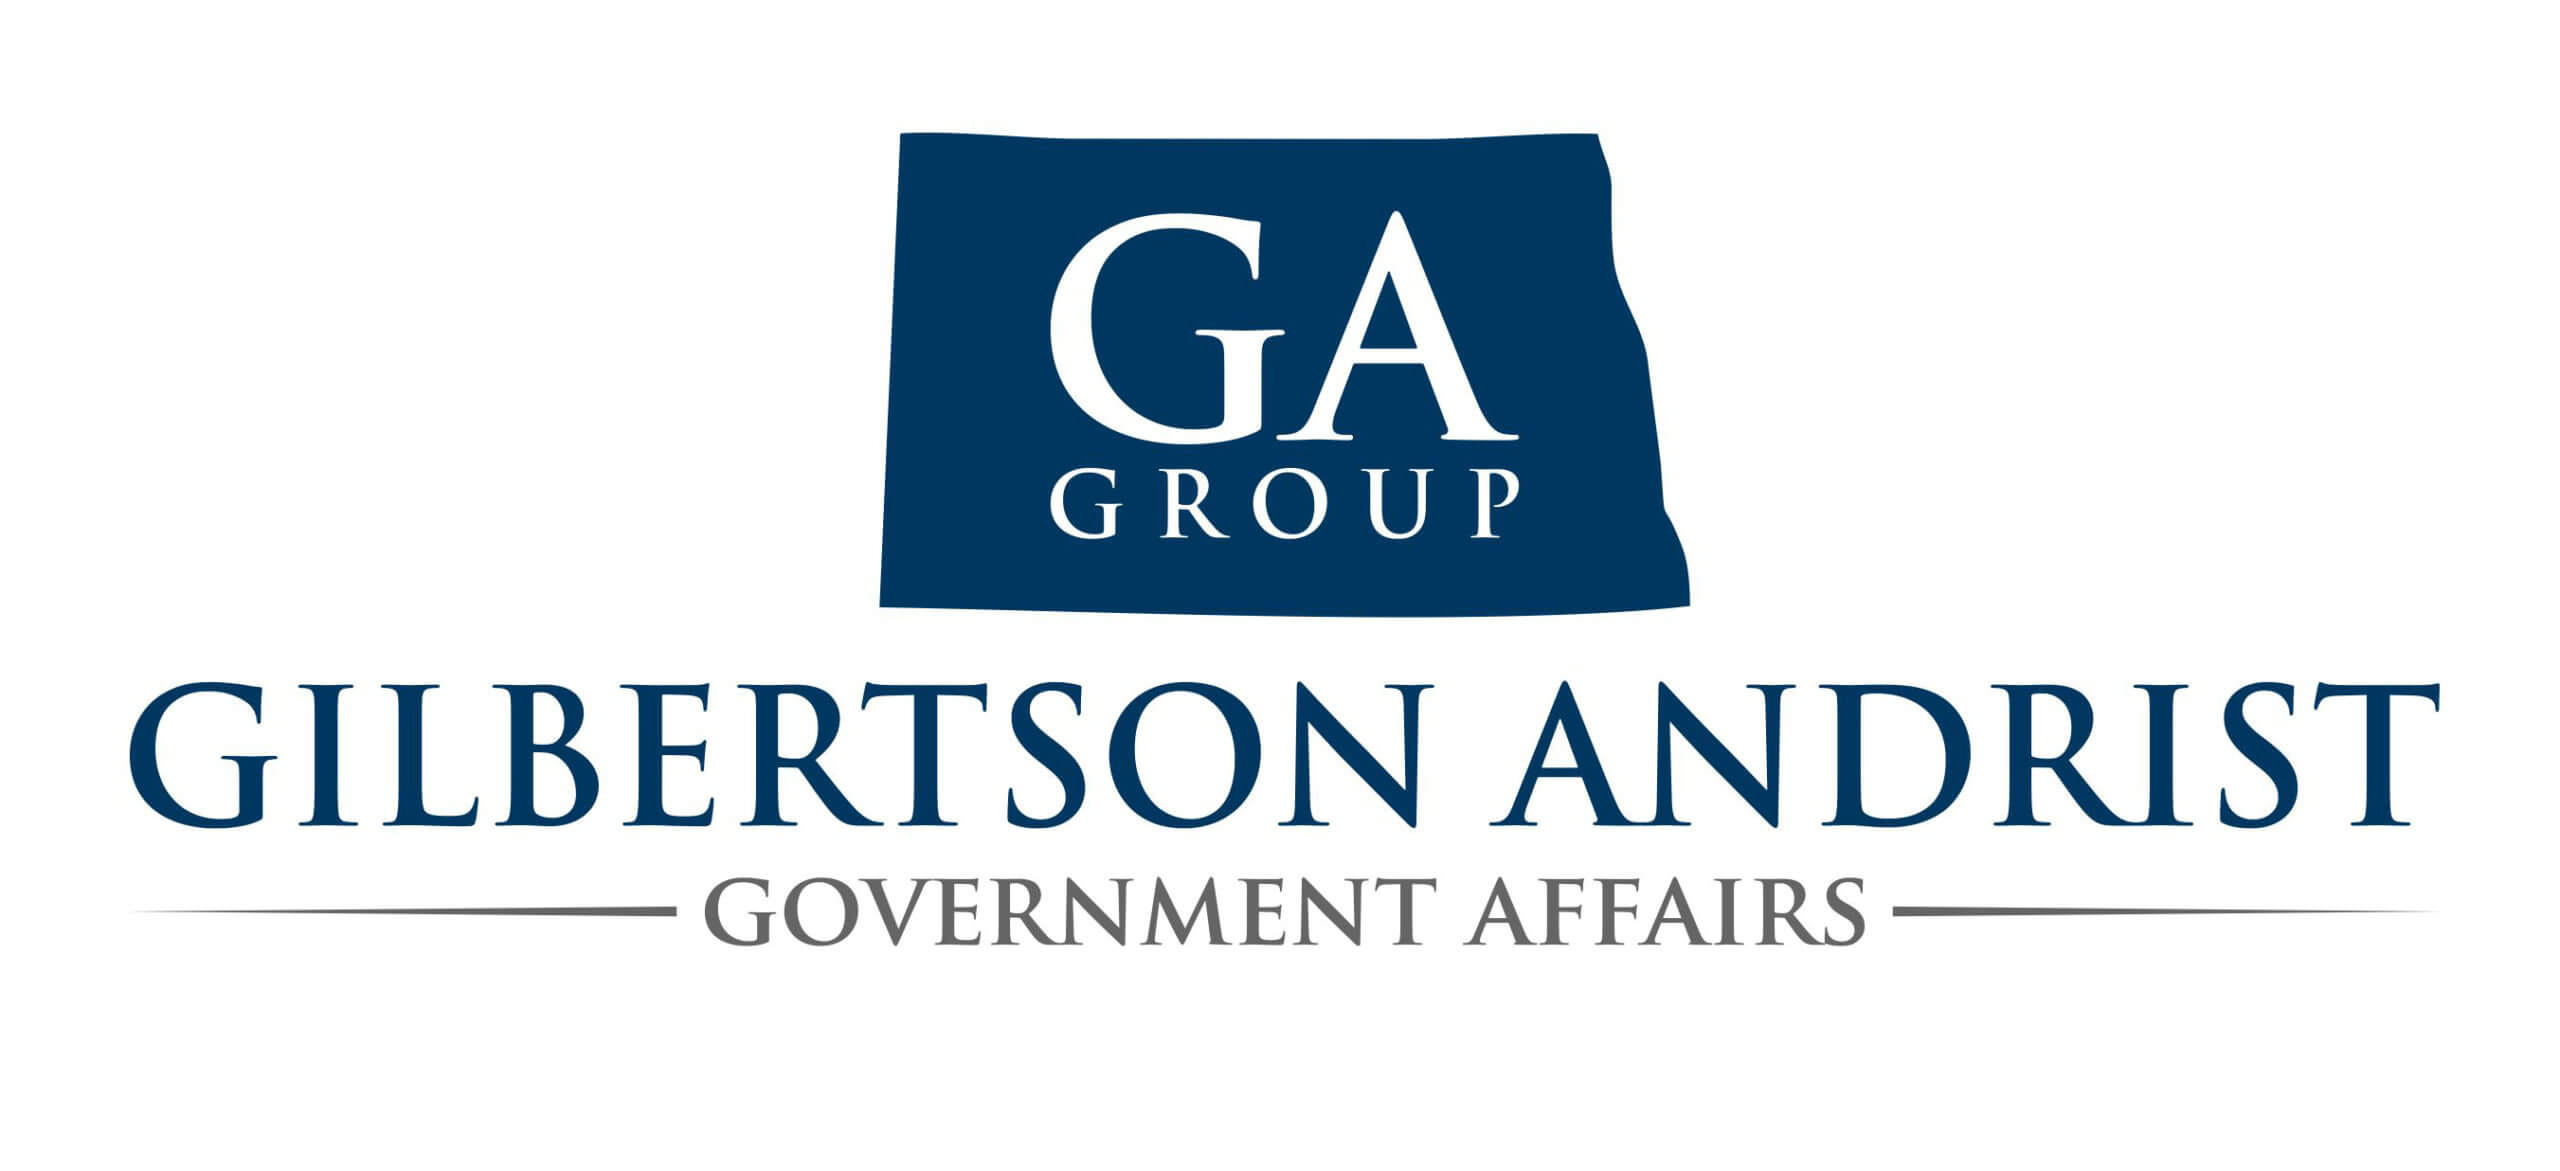 GA Logo_Gilbert